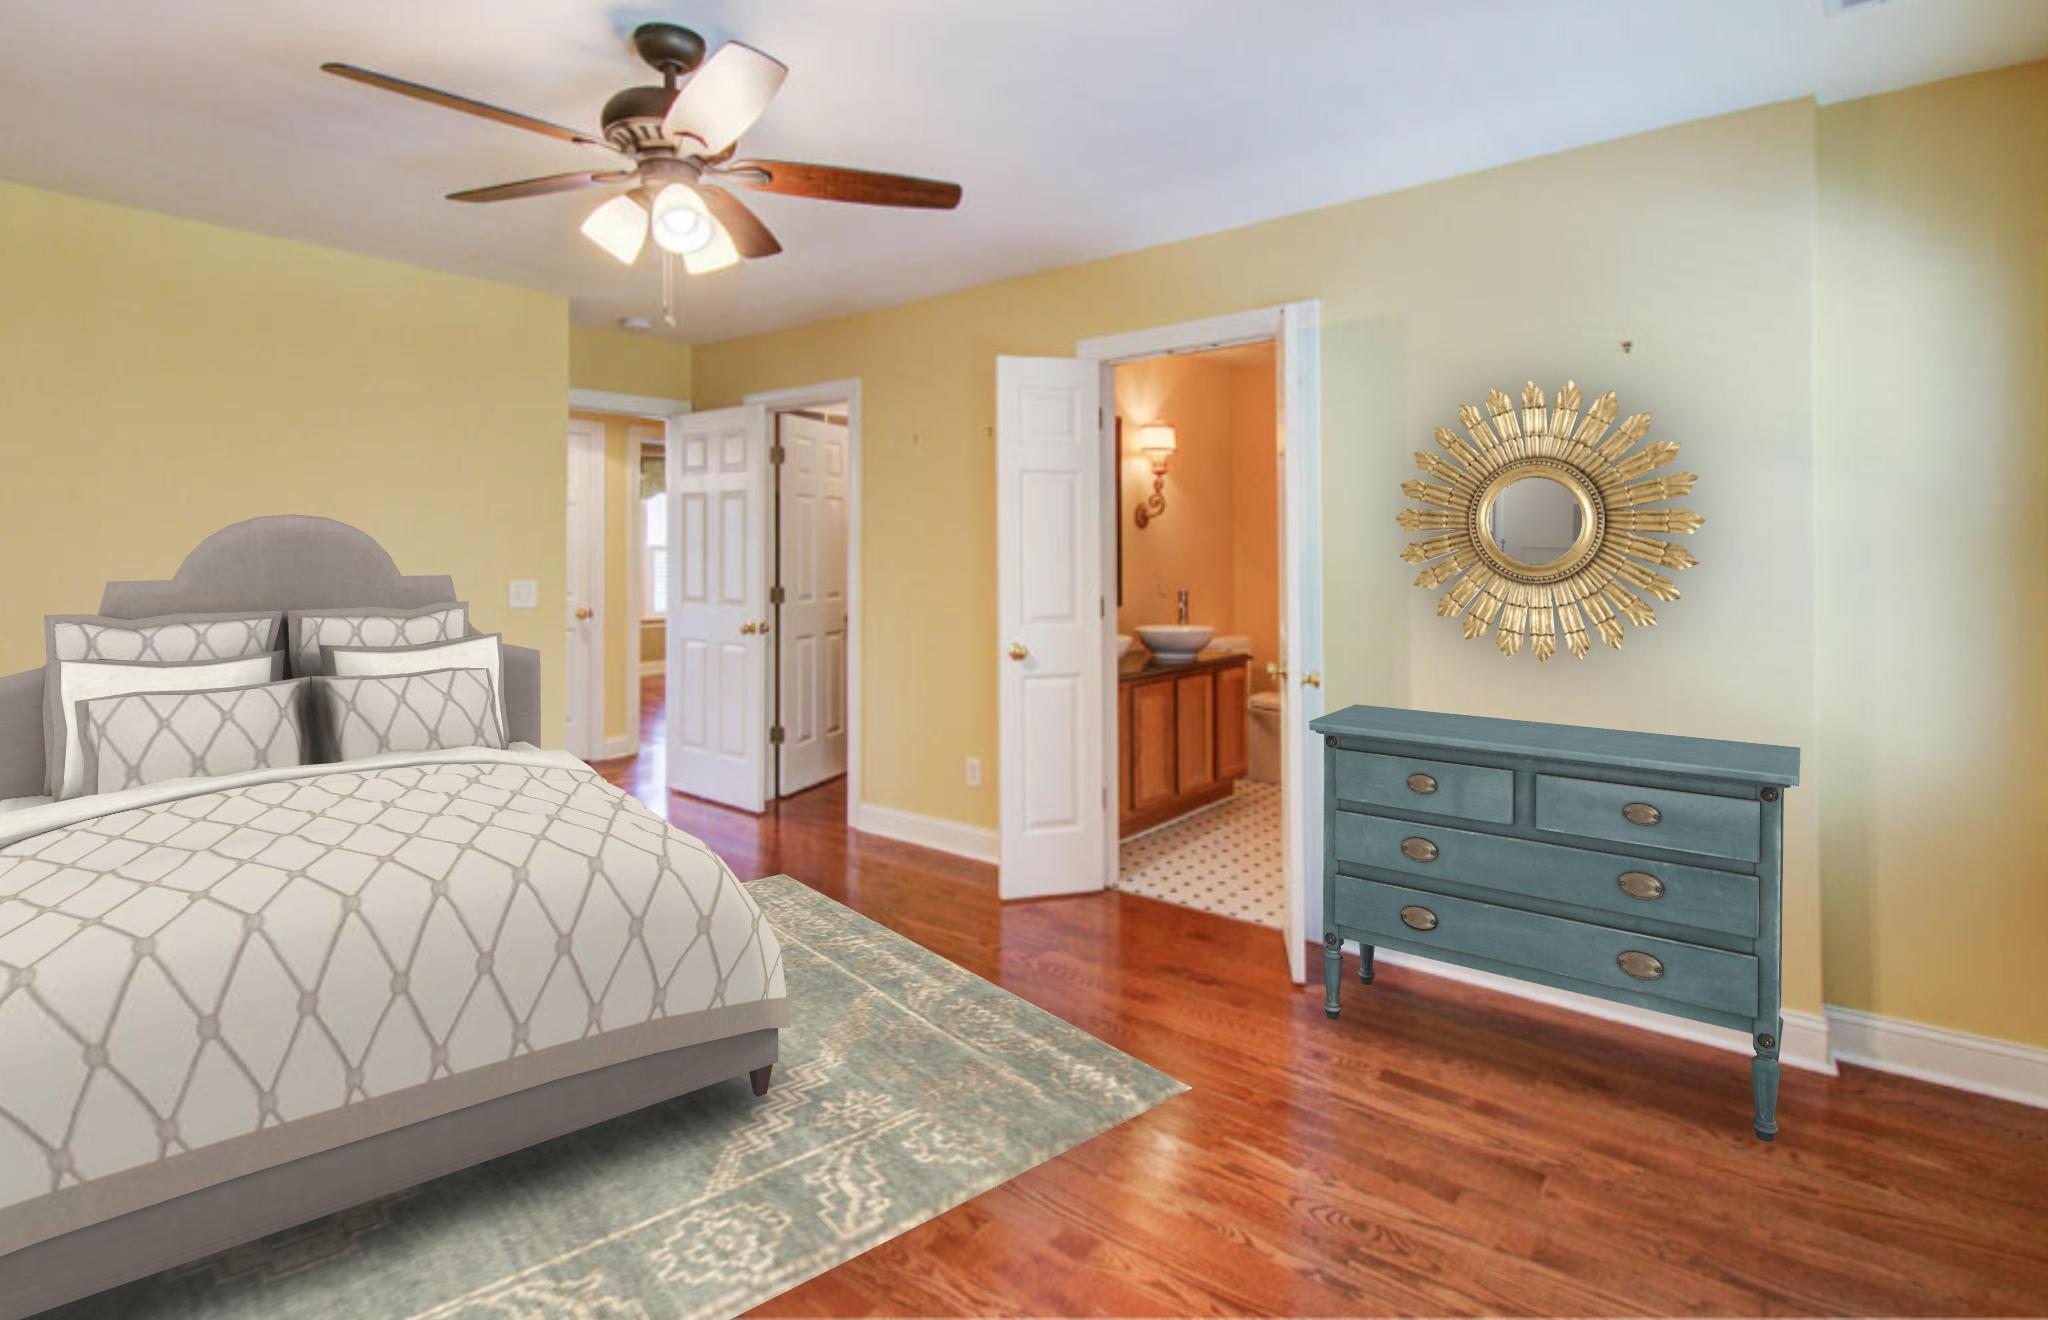 Center Park Homes For Sale - 950 Crossing, Daniel Island, SC - 48